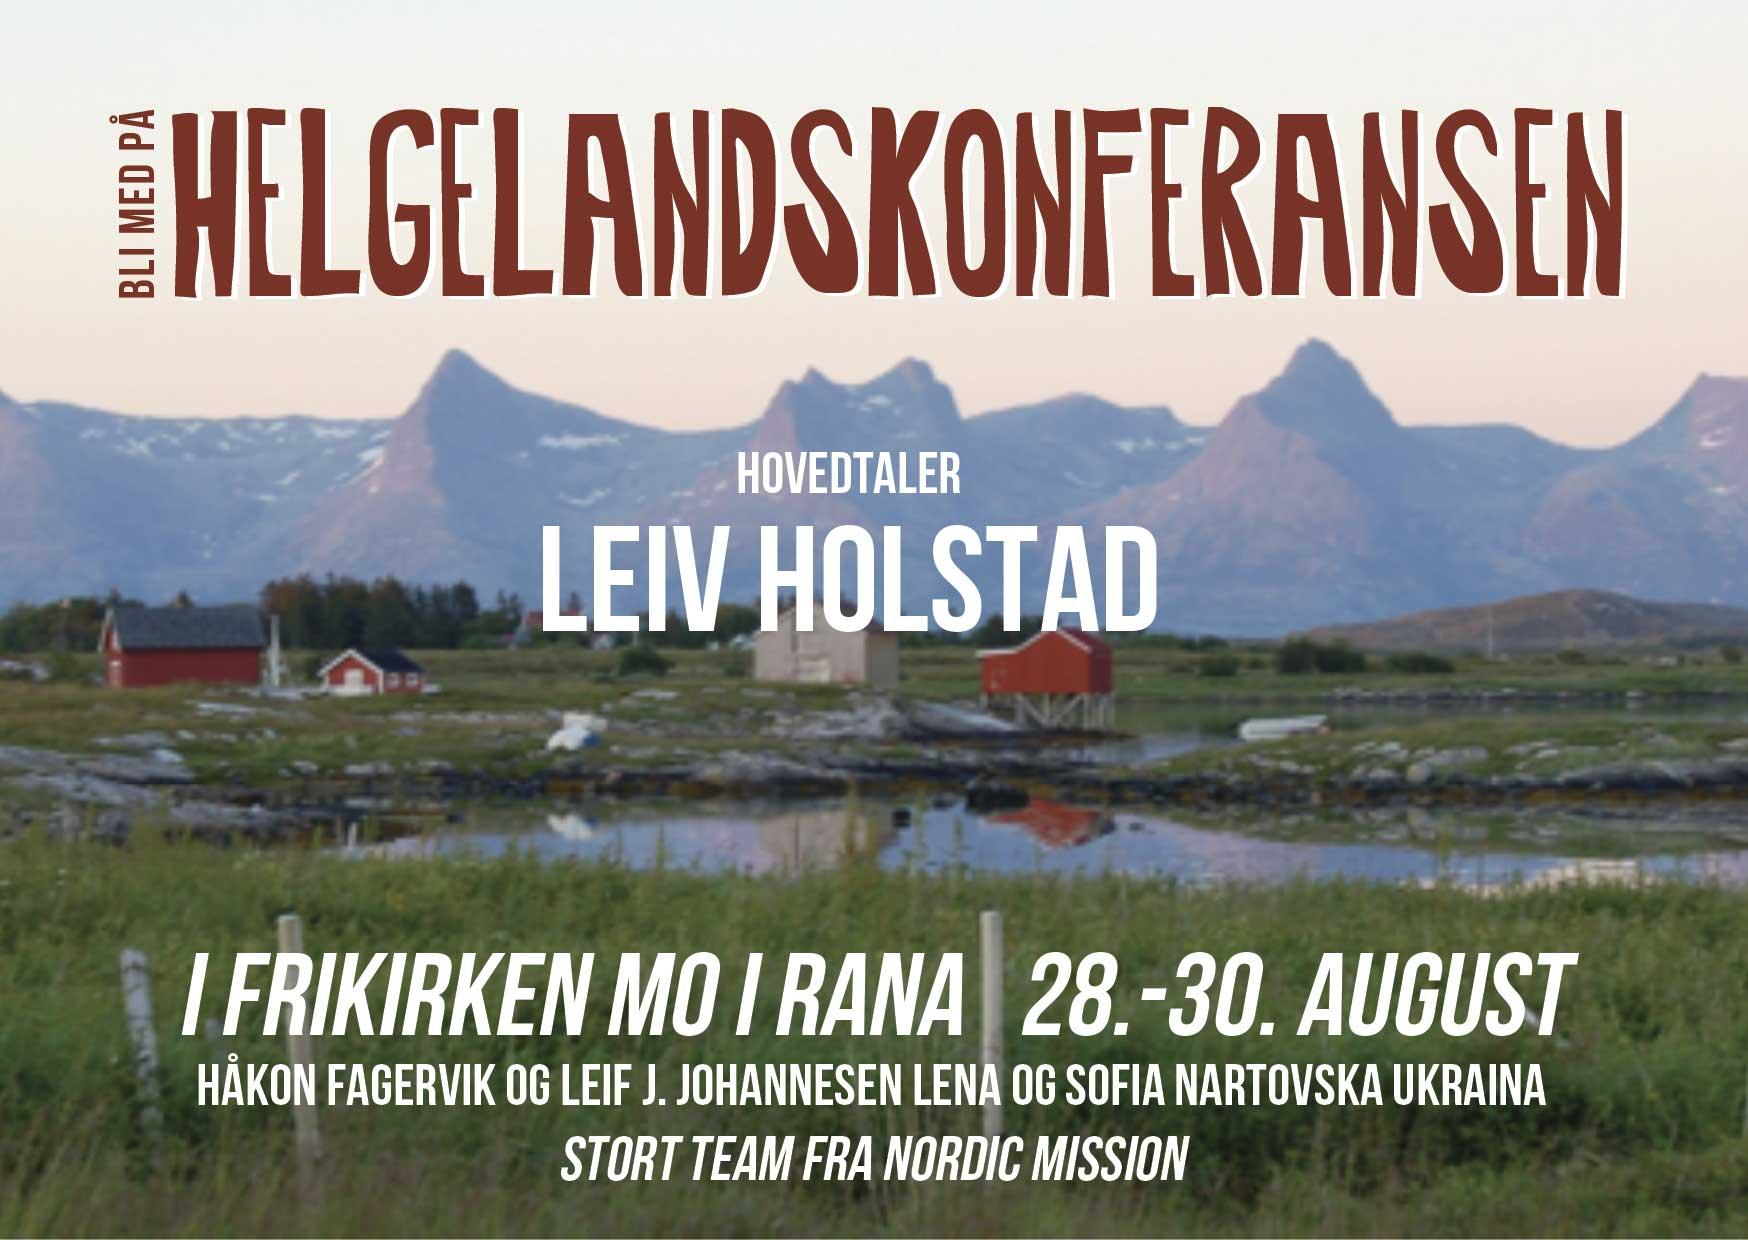 HelgelandsKonferansen